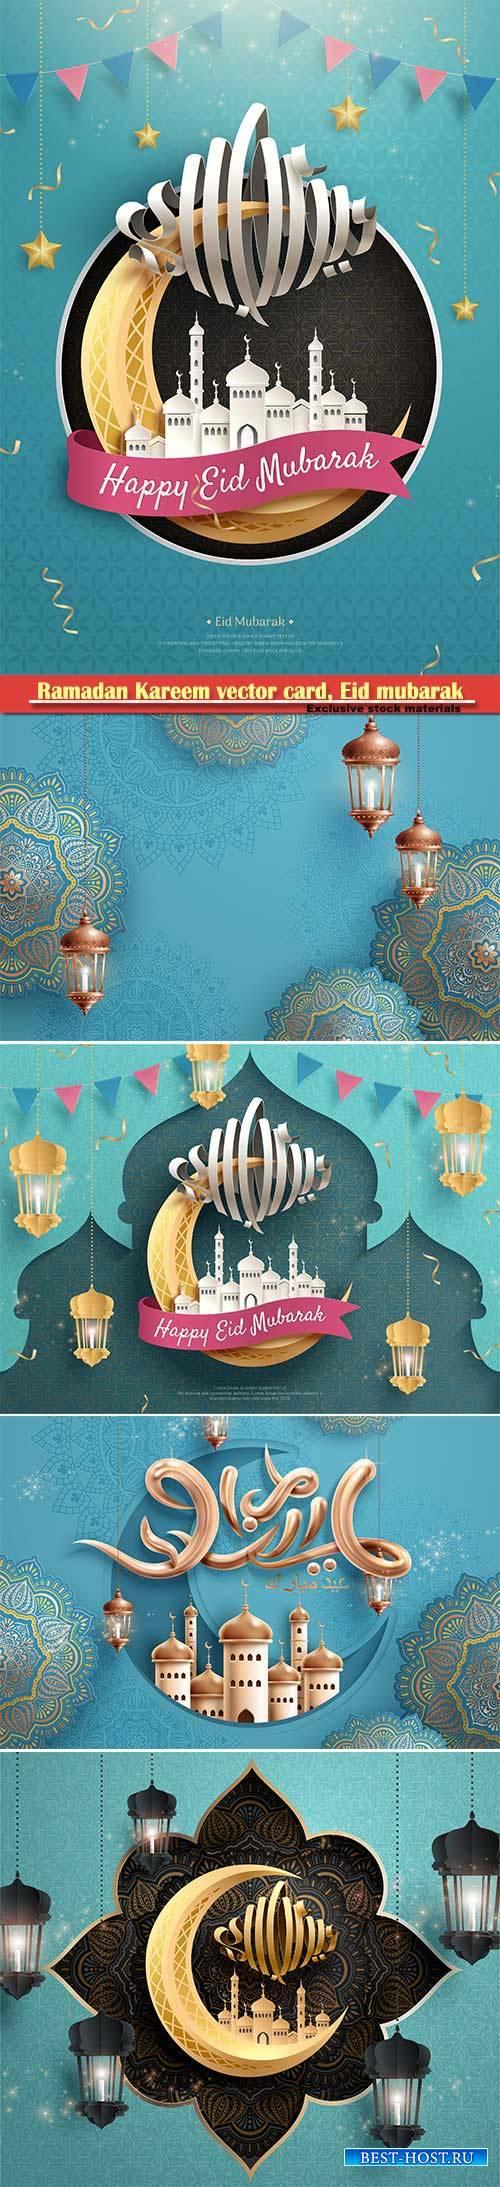 Ramadan Kareem vector card, Eid mubarak calligraphy design templates # 8